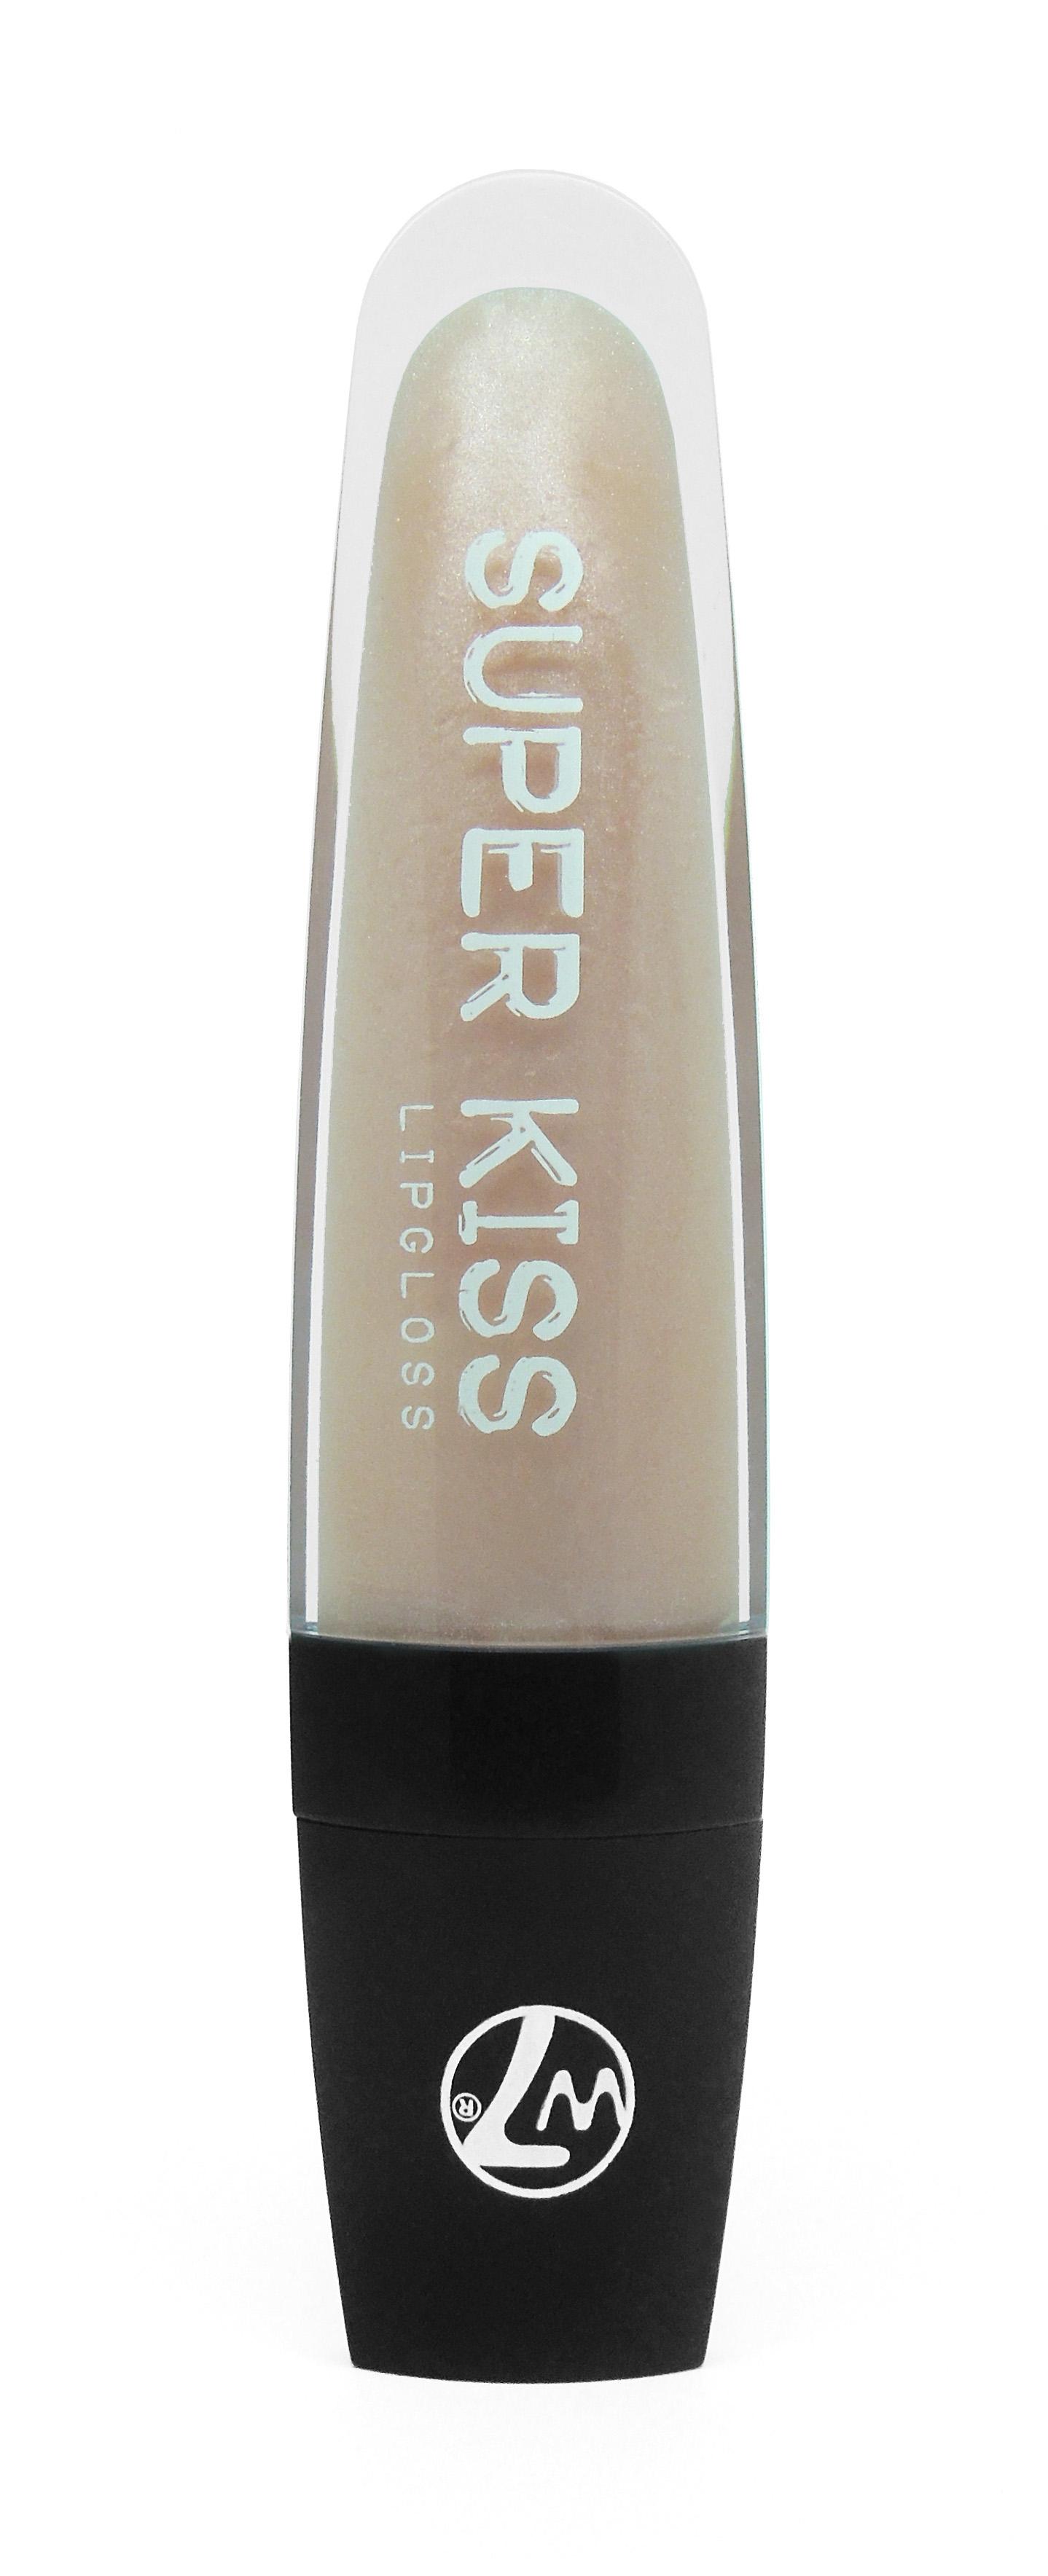 W7 Super Kiss Lipgloss [CLONE]